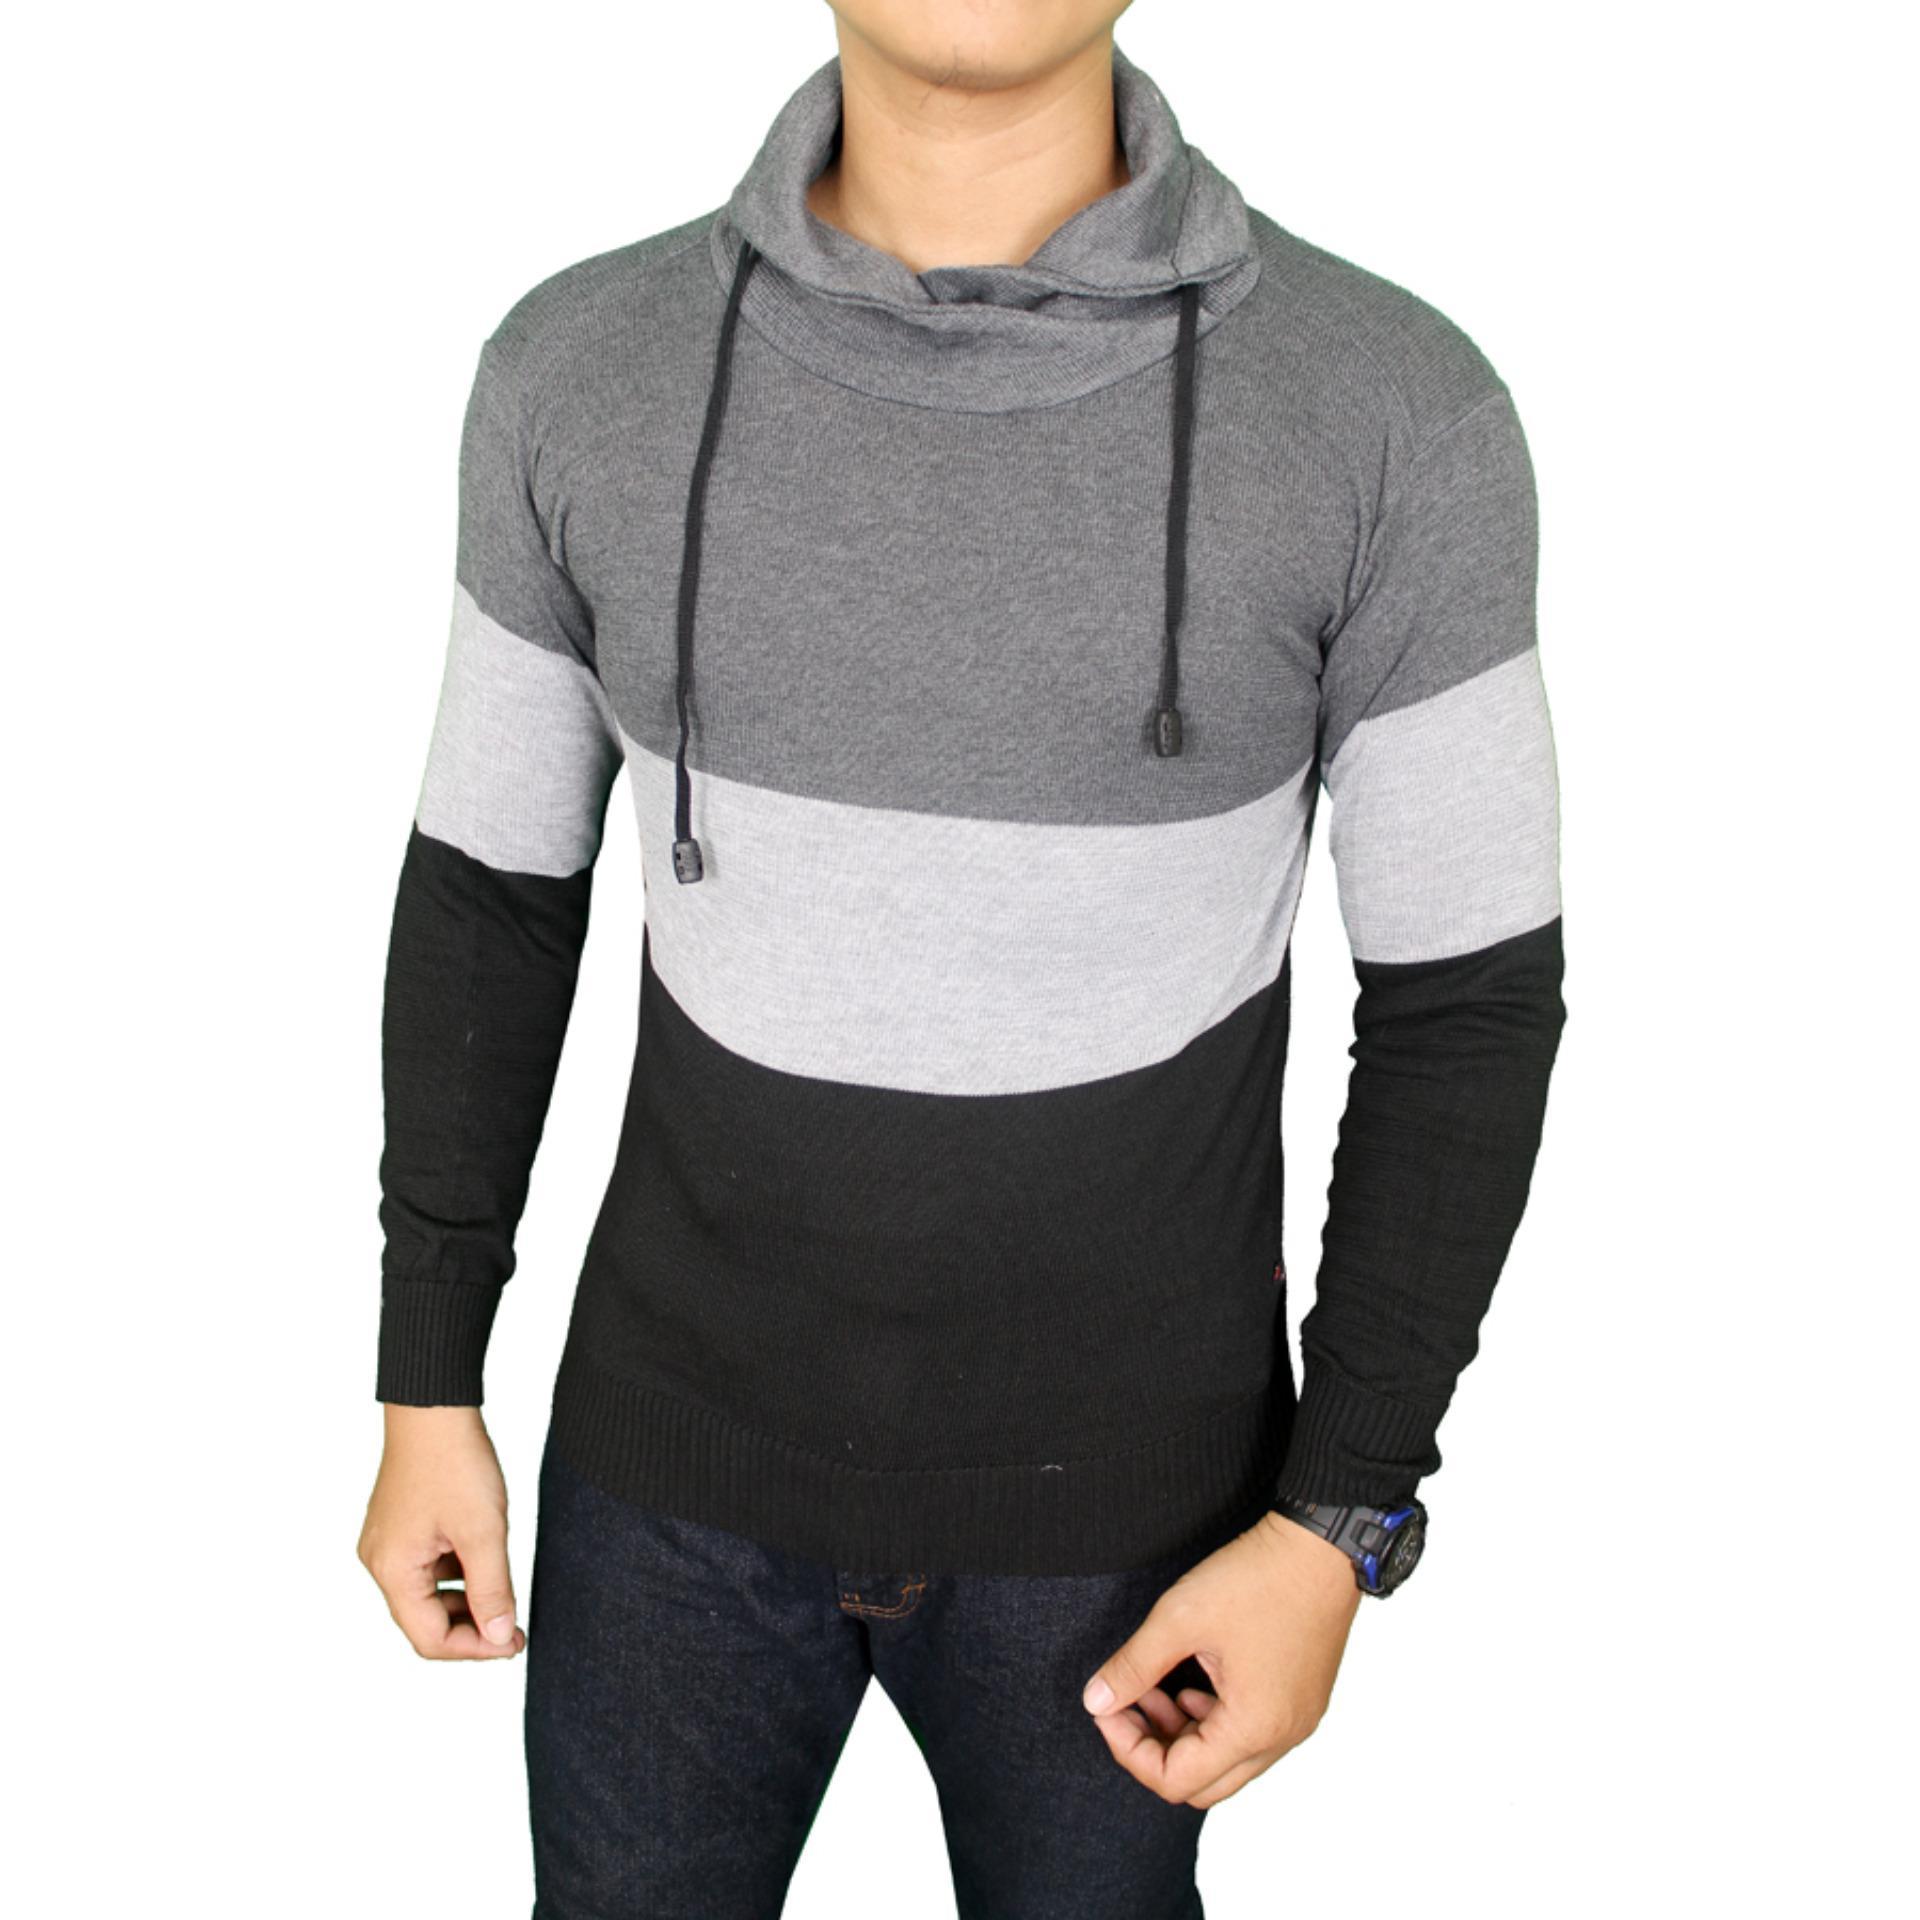 Gudang Fashion Dompet Pria Hitam Daftar Update Harga Jas Semi Formal Stretch Grey Blz 723 Jual Terbaru Lazada Co Id Source Sweater